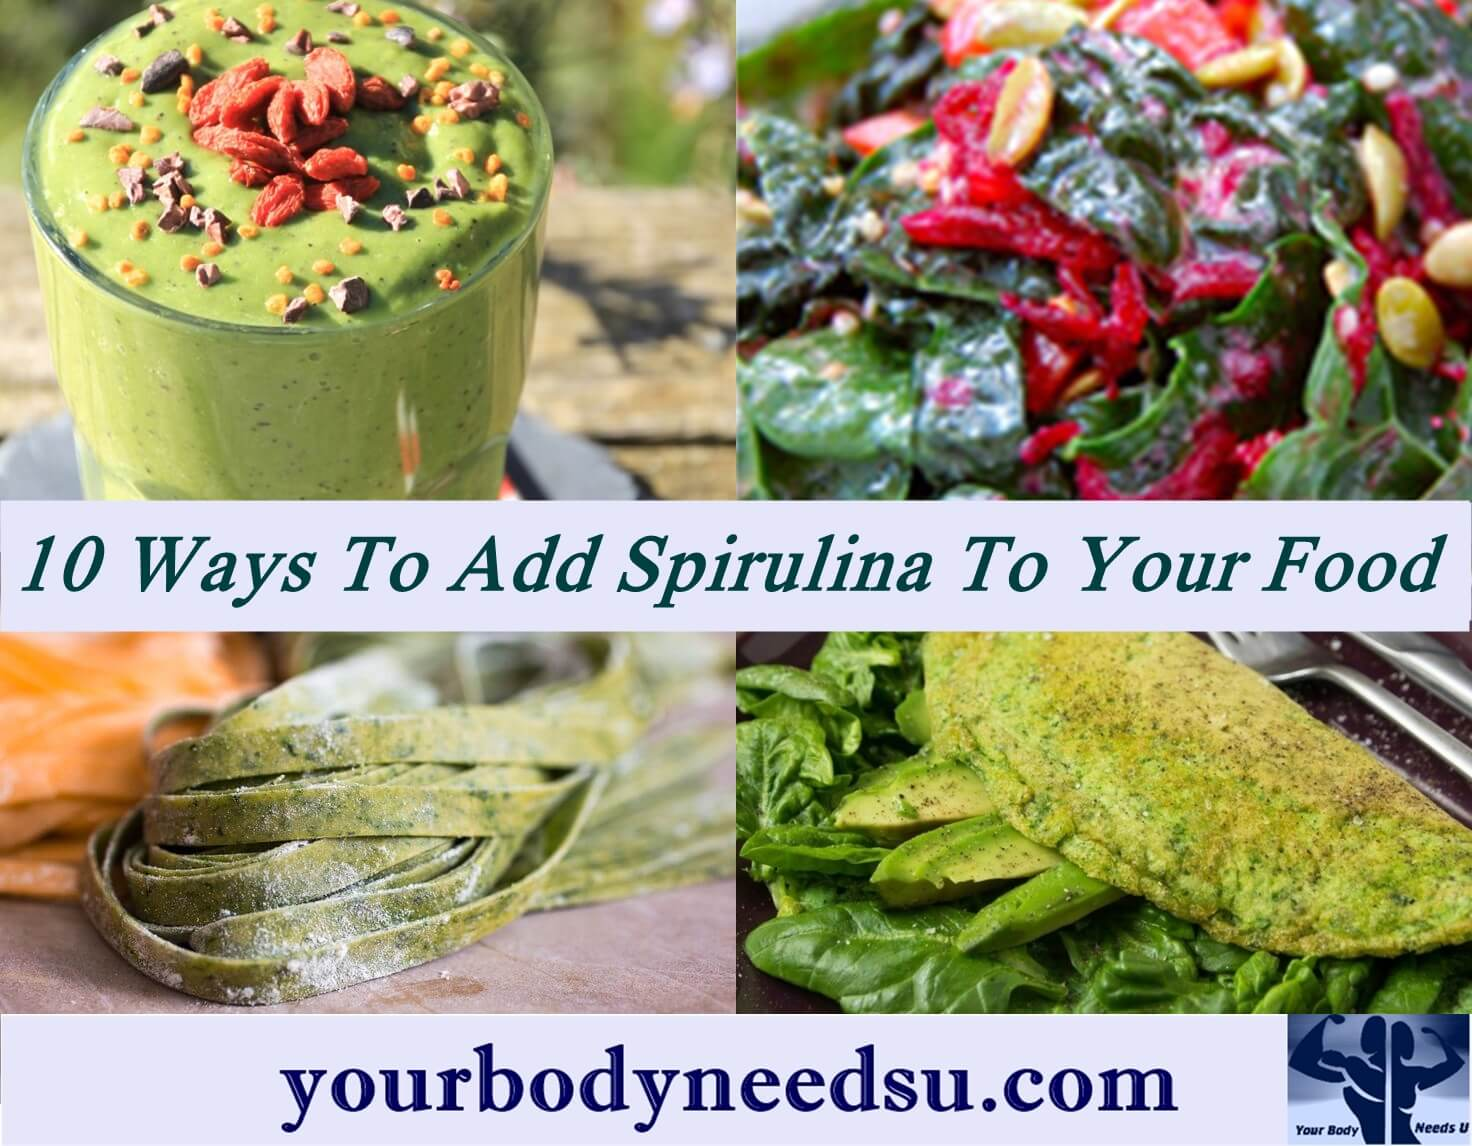 10 Ways To Add Spirulina To Your Food